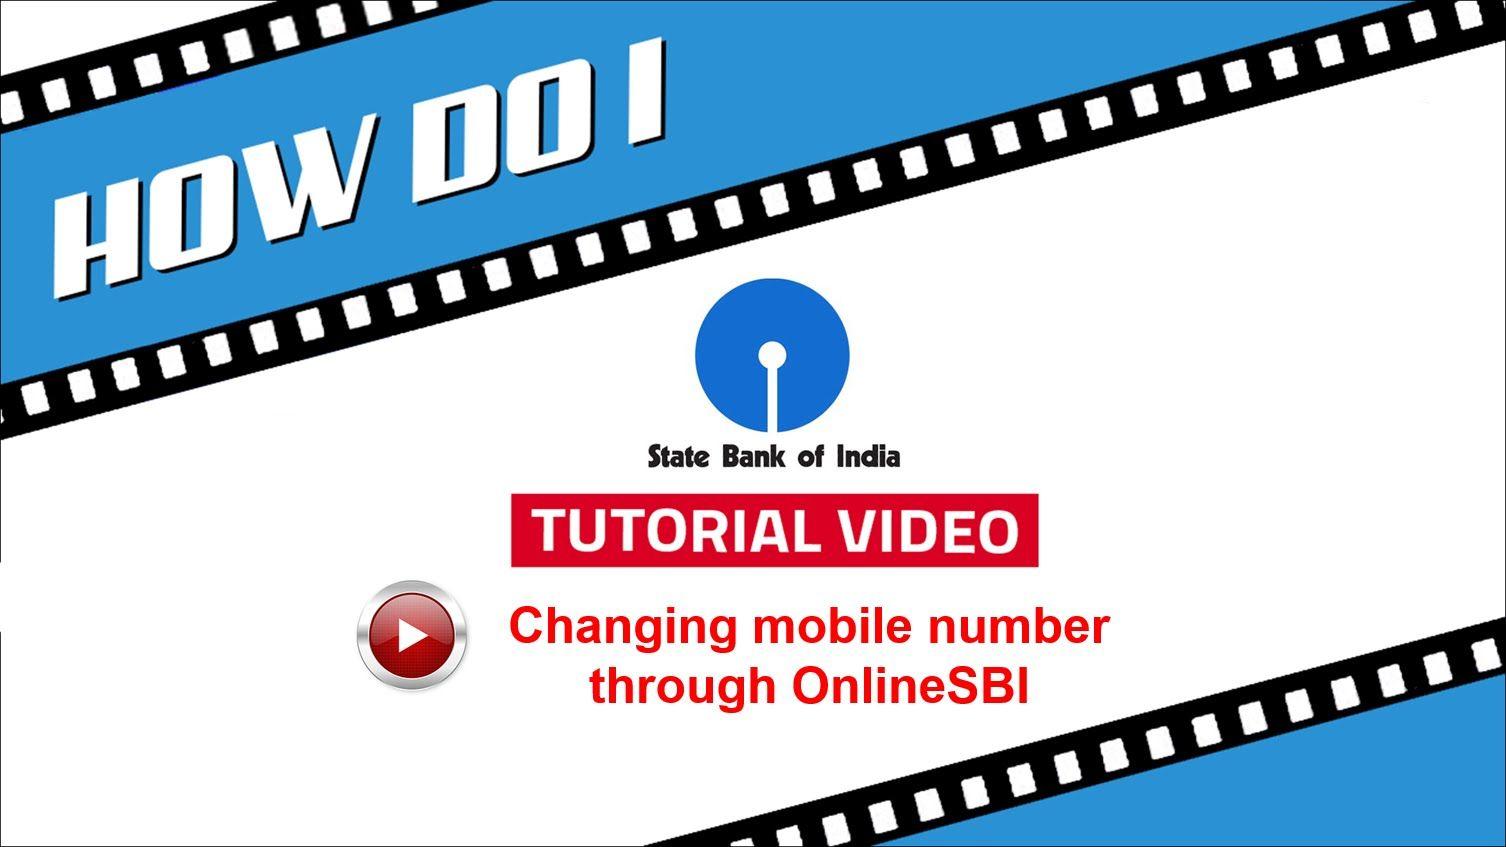 SBI INB: Change mobile number through OnlineSBI | How Do I | Pinterest